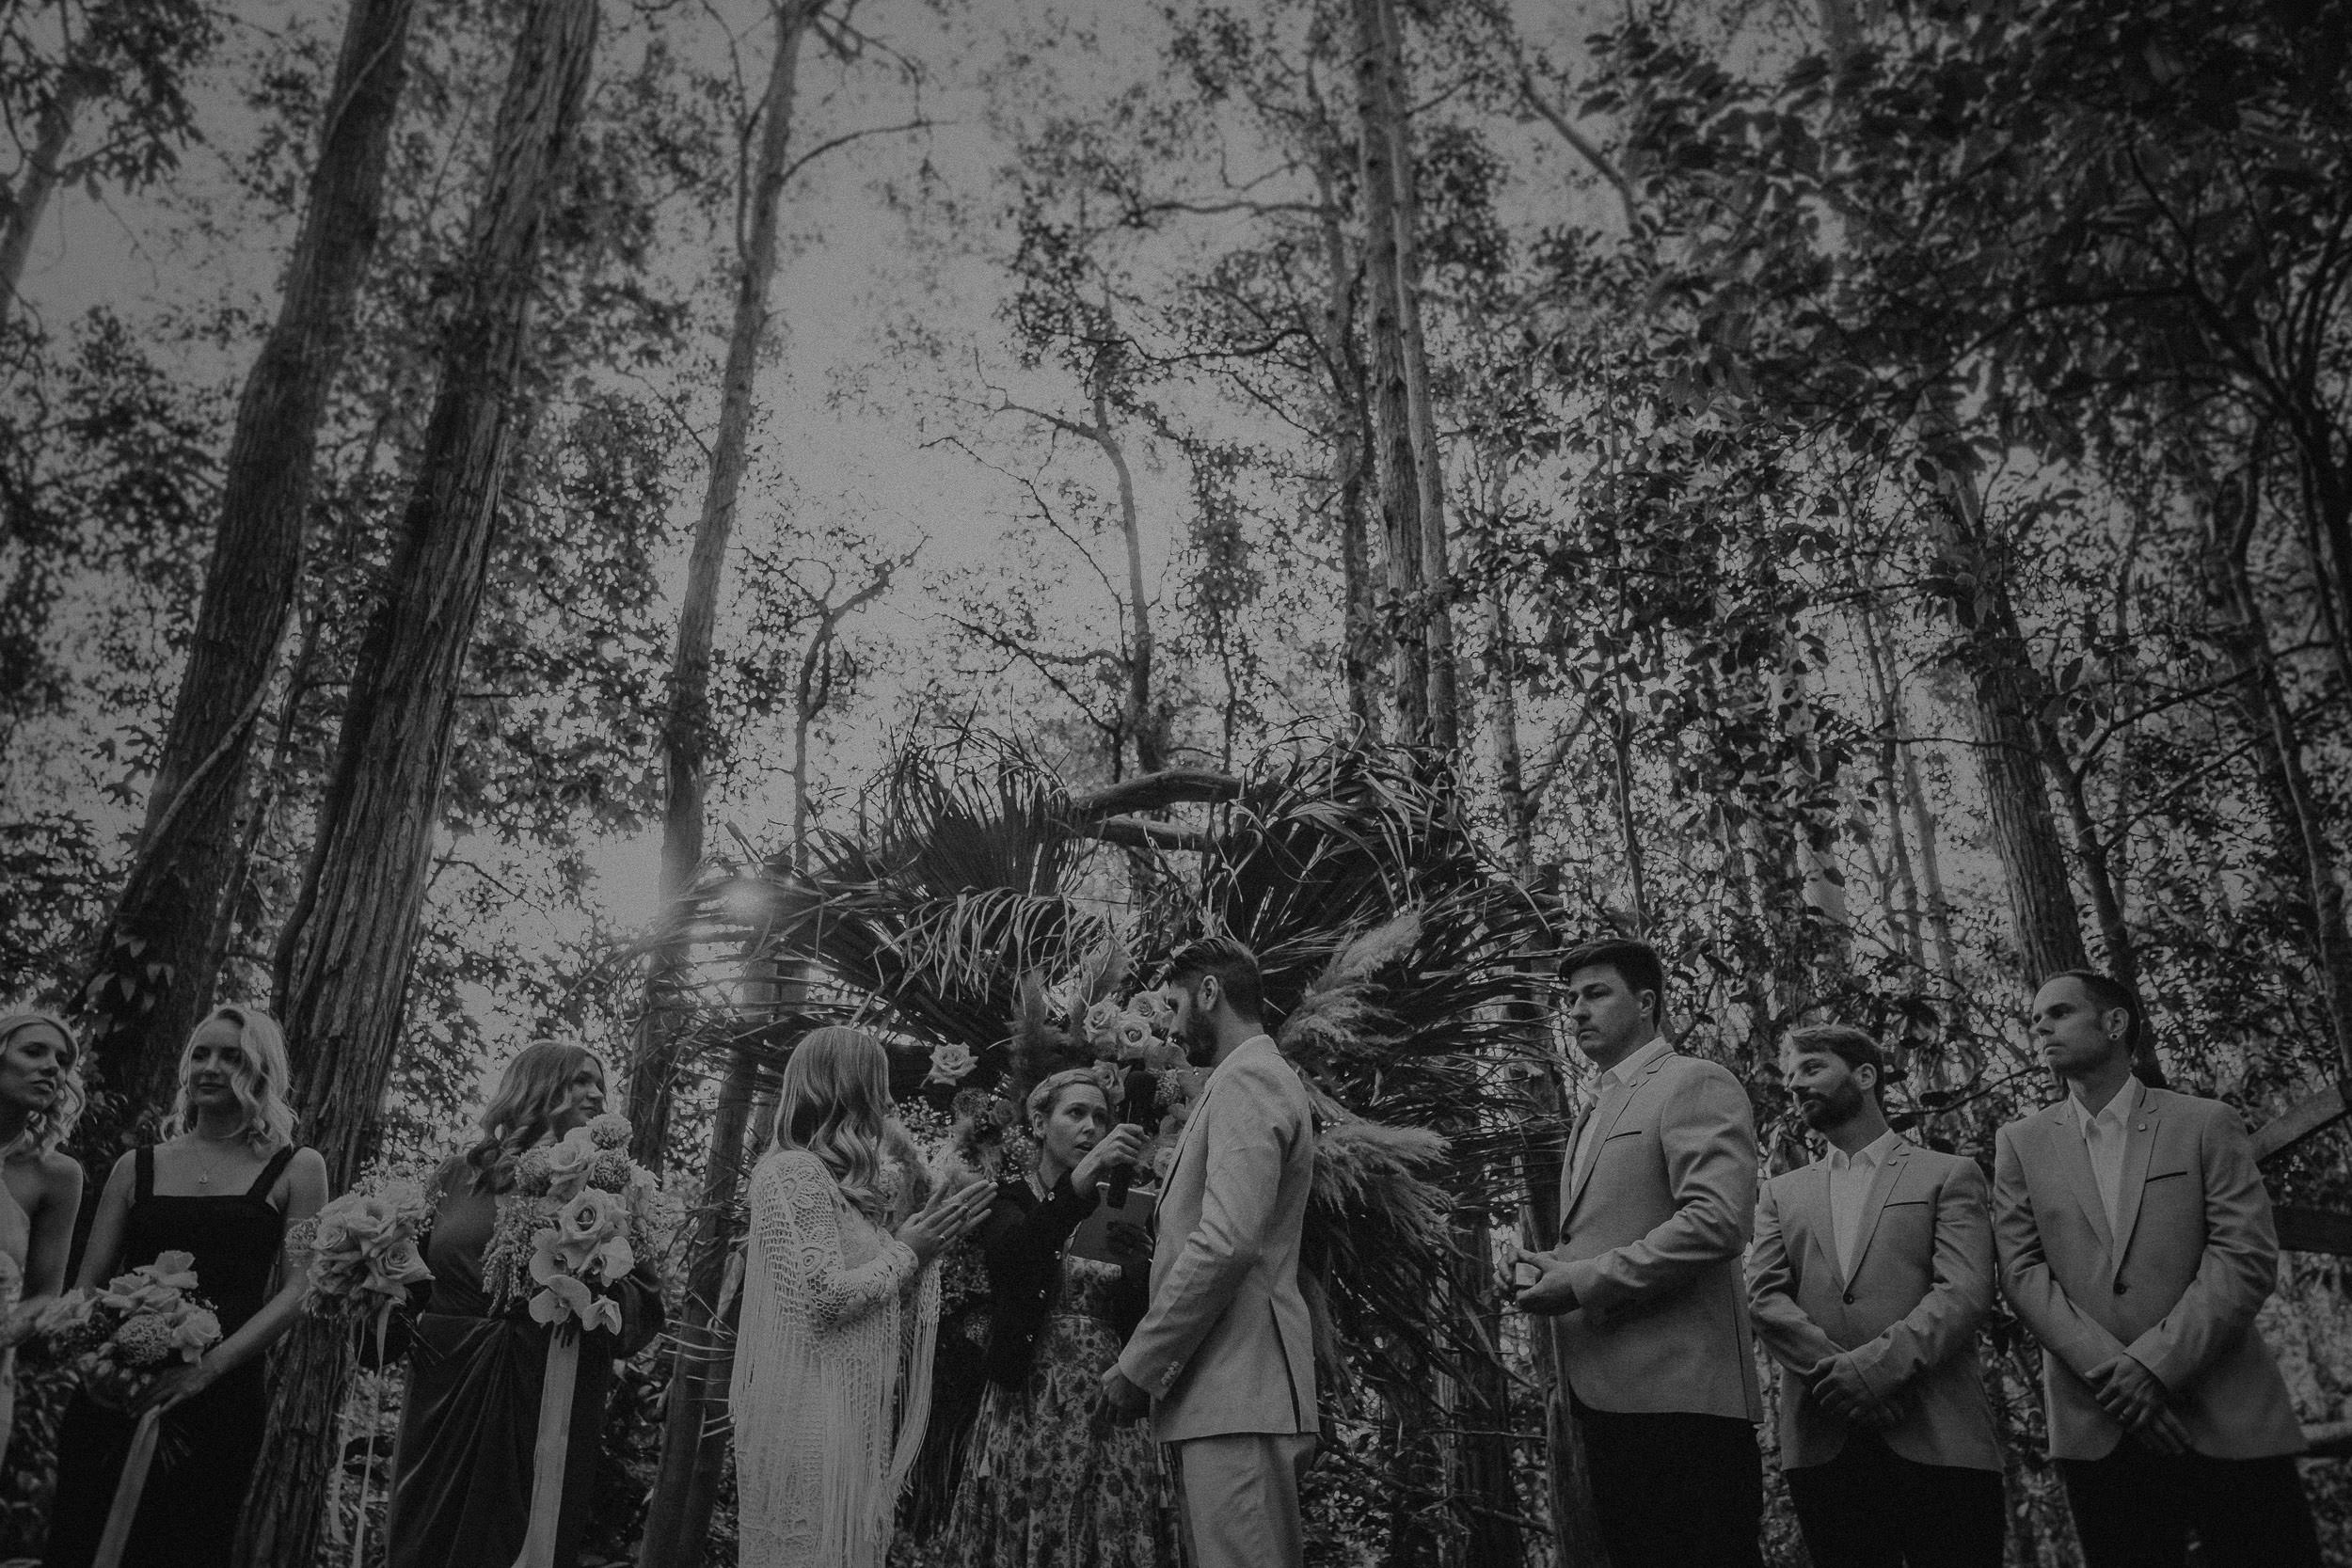 S&A Elopement - Kings & Thieves - Shred 'Til Dead - Central Coast Beach Forest Wedding - 209.jpg